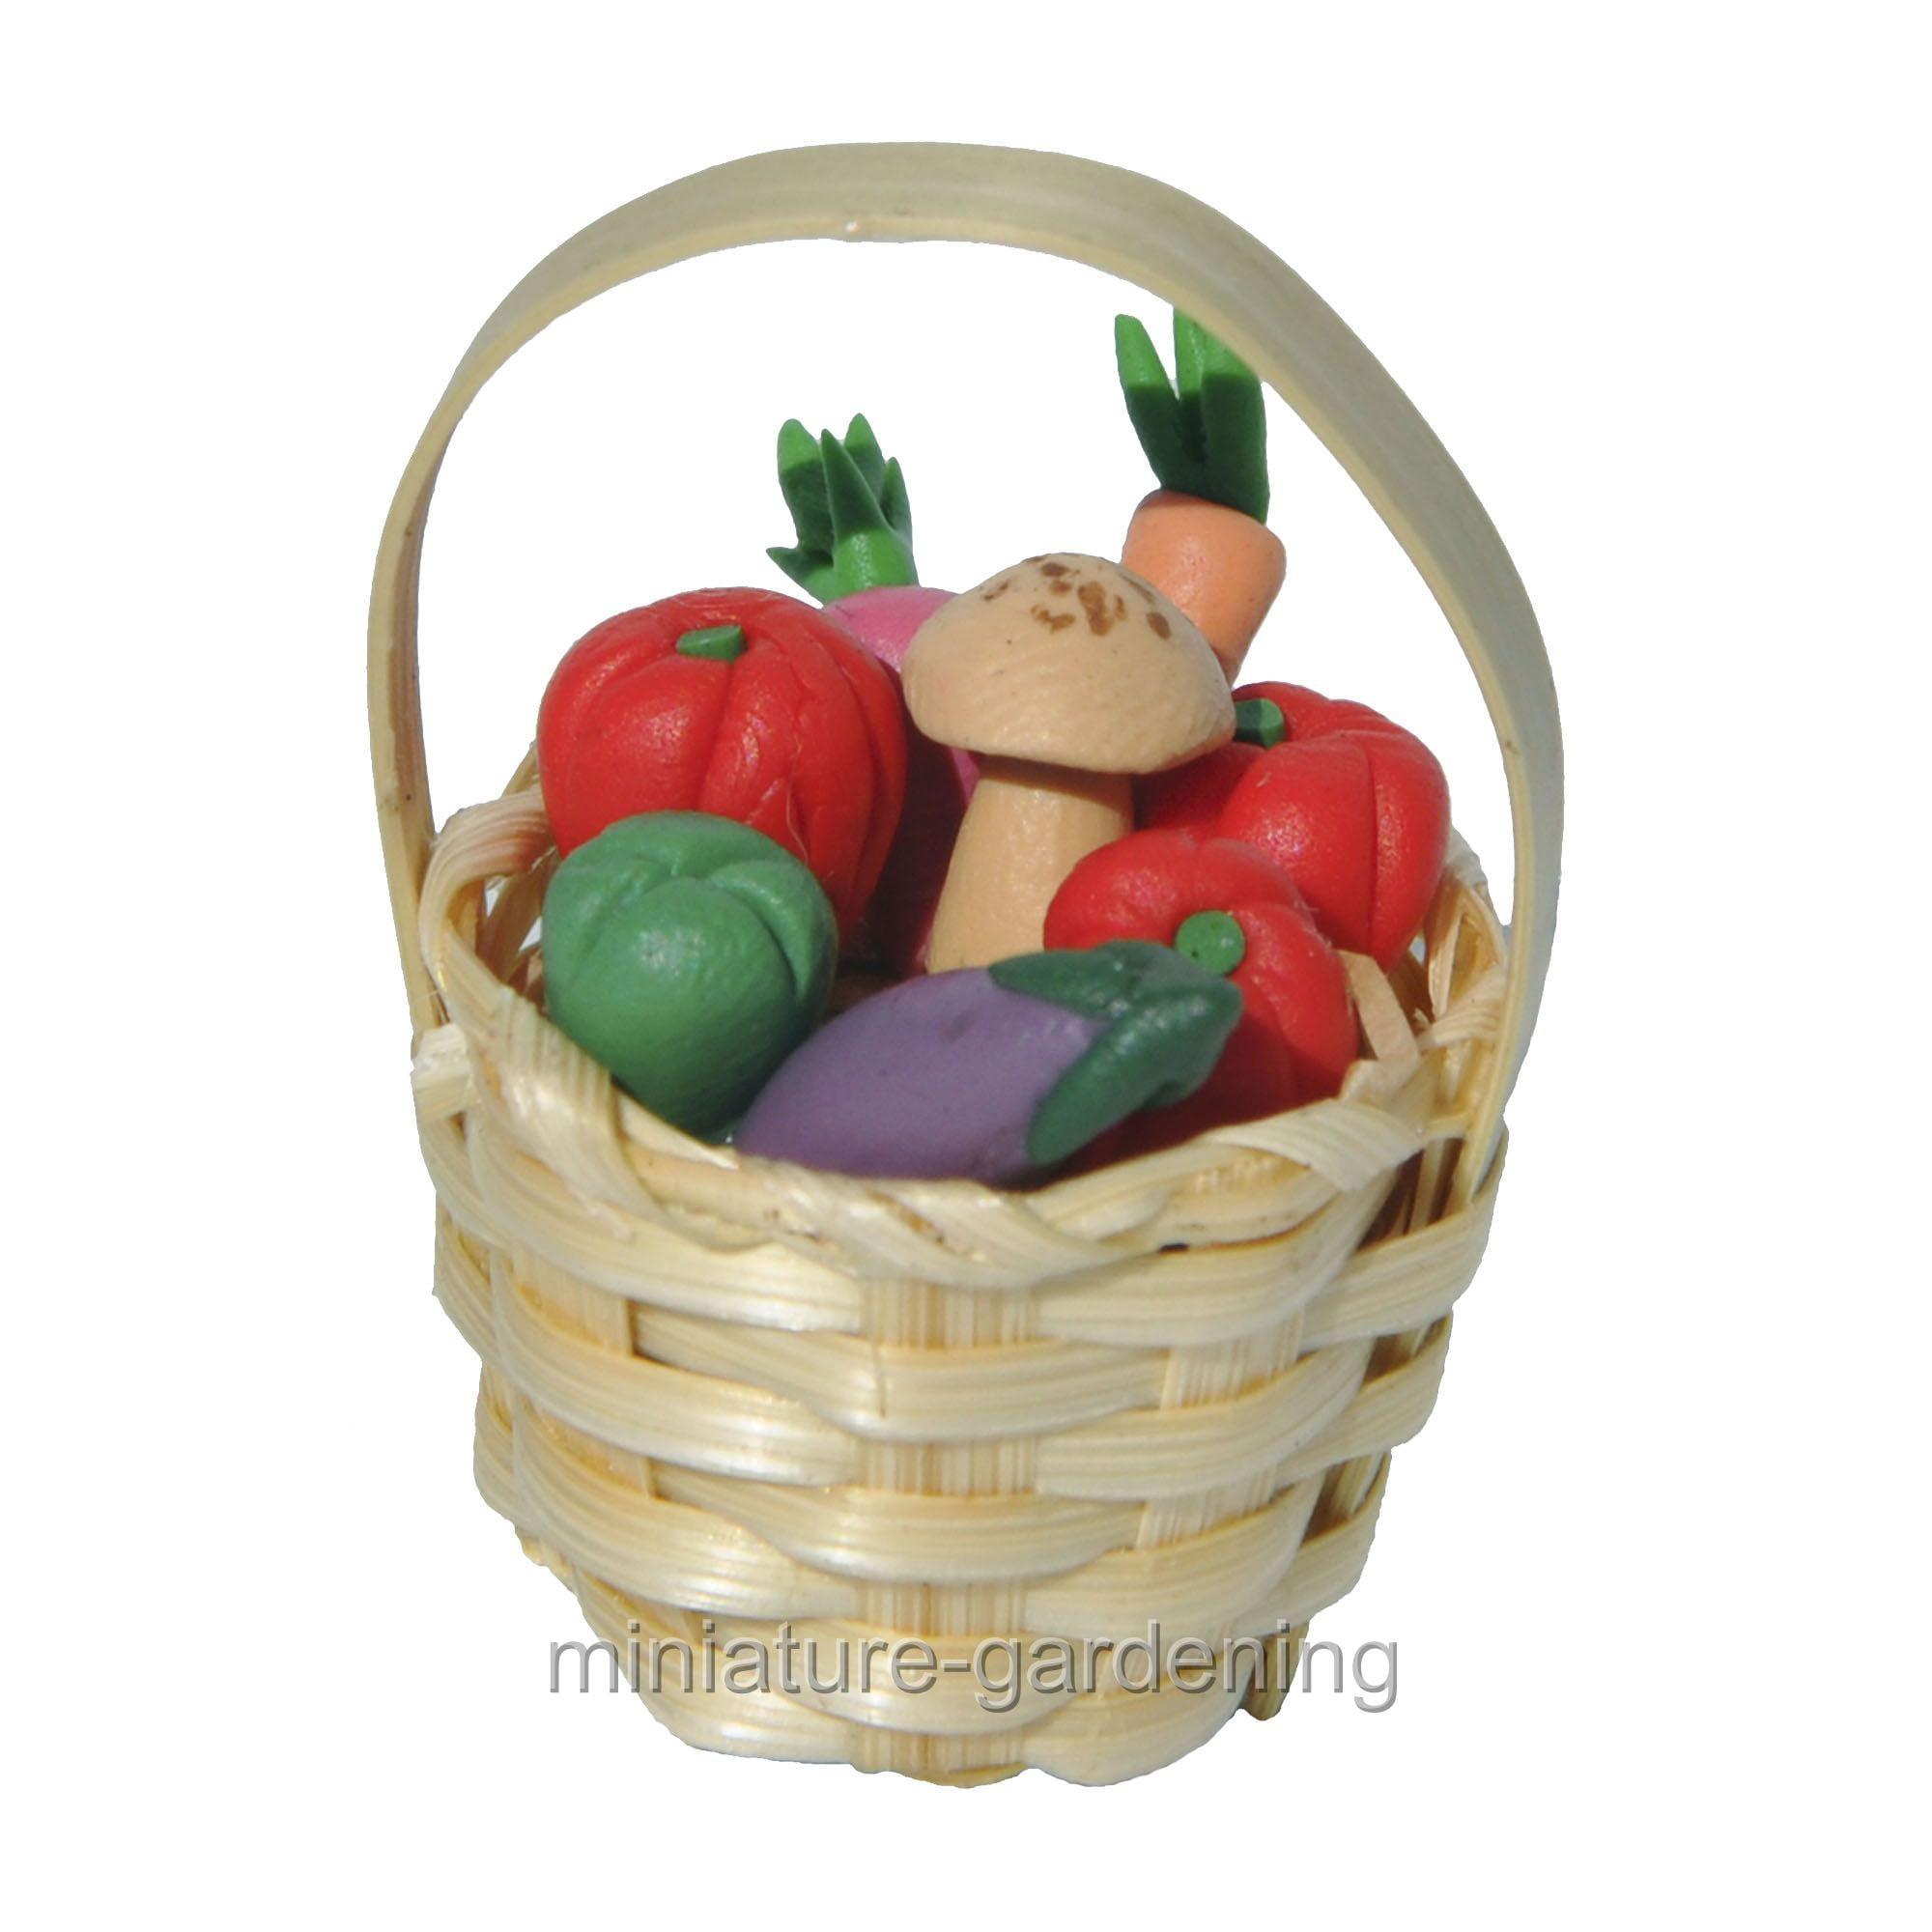 10  Mini Wicker Baskets Fruit Vegetable Craft Picnic Miniatures Food /& Groceries